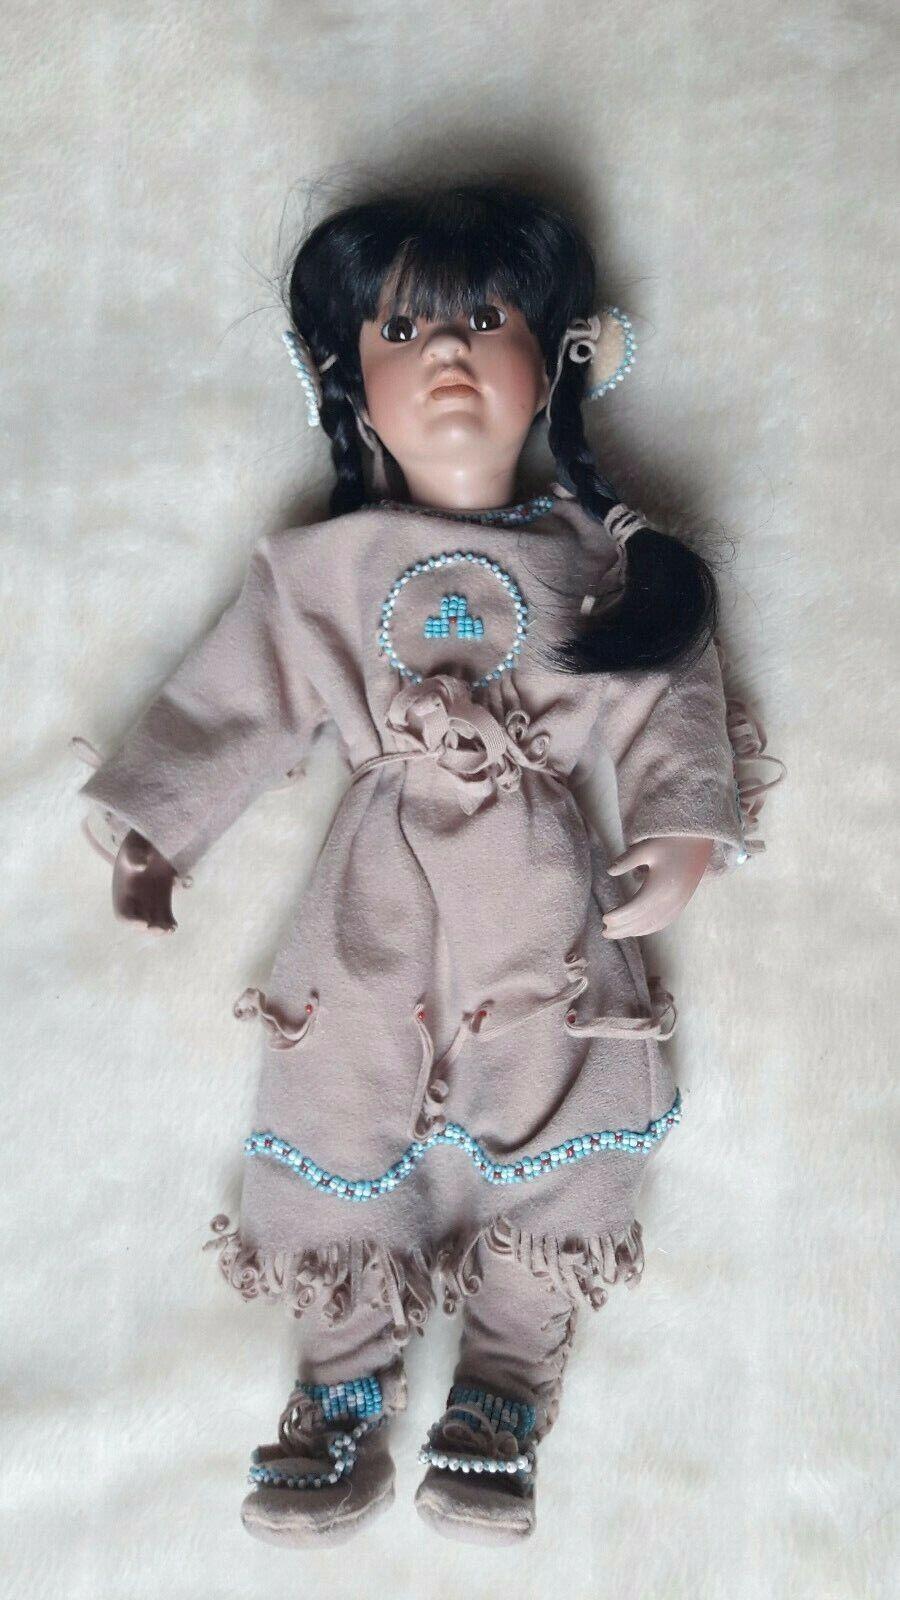 1991 Linda Mason Many Stars American Indian Doll Doll Doll Porzellan Sammerpuppe 35 cm 53ed51